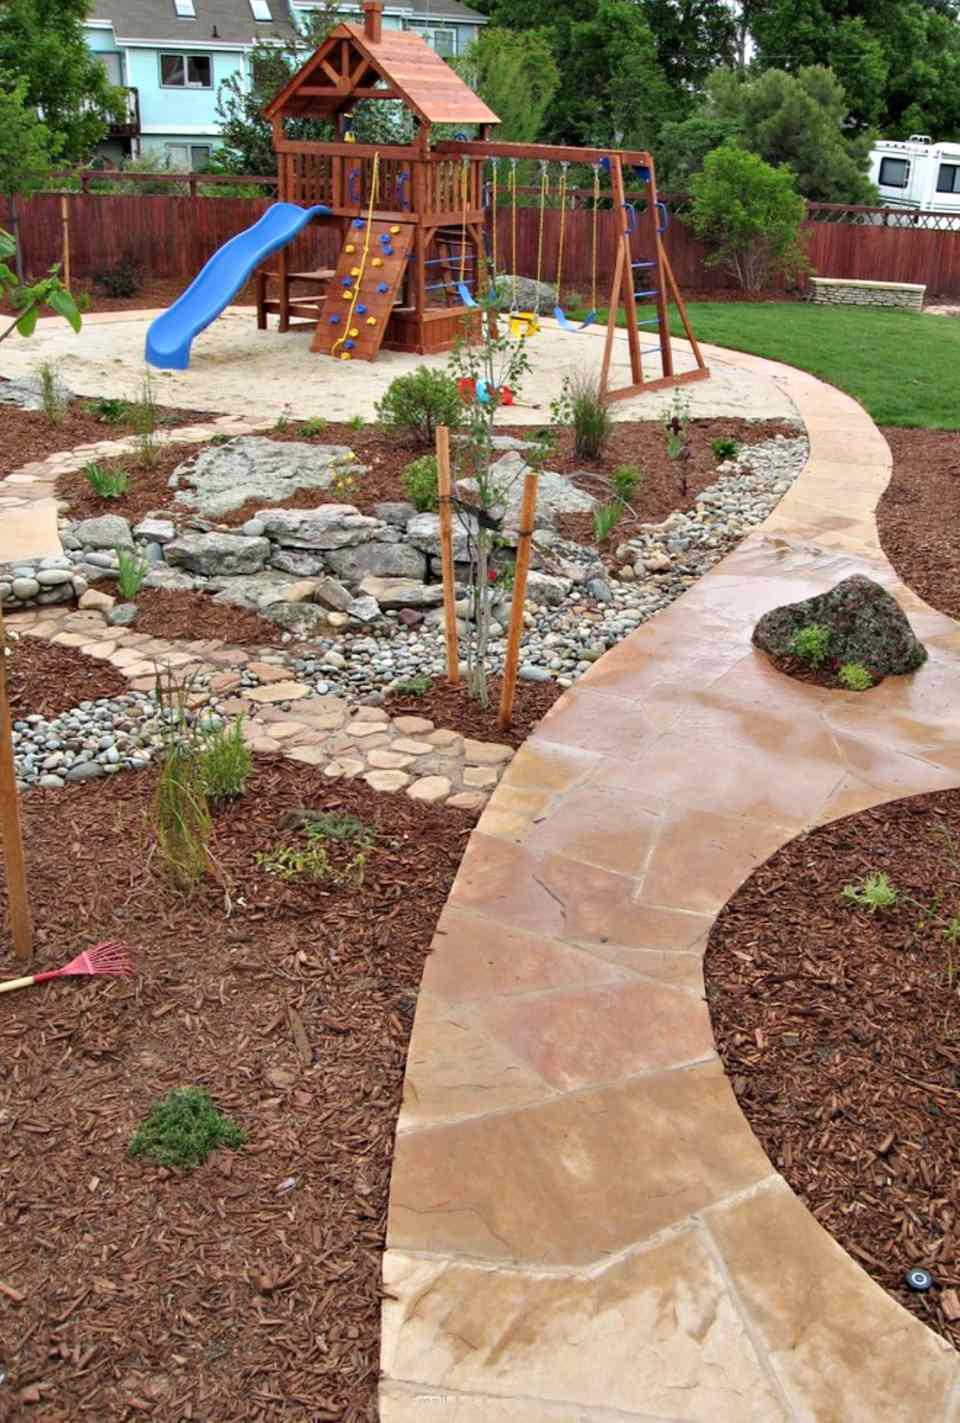 15 Fun Backyard Ideas For Kids